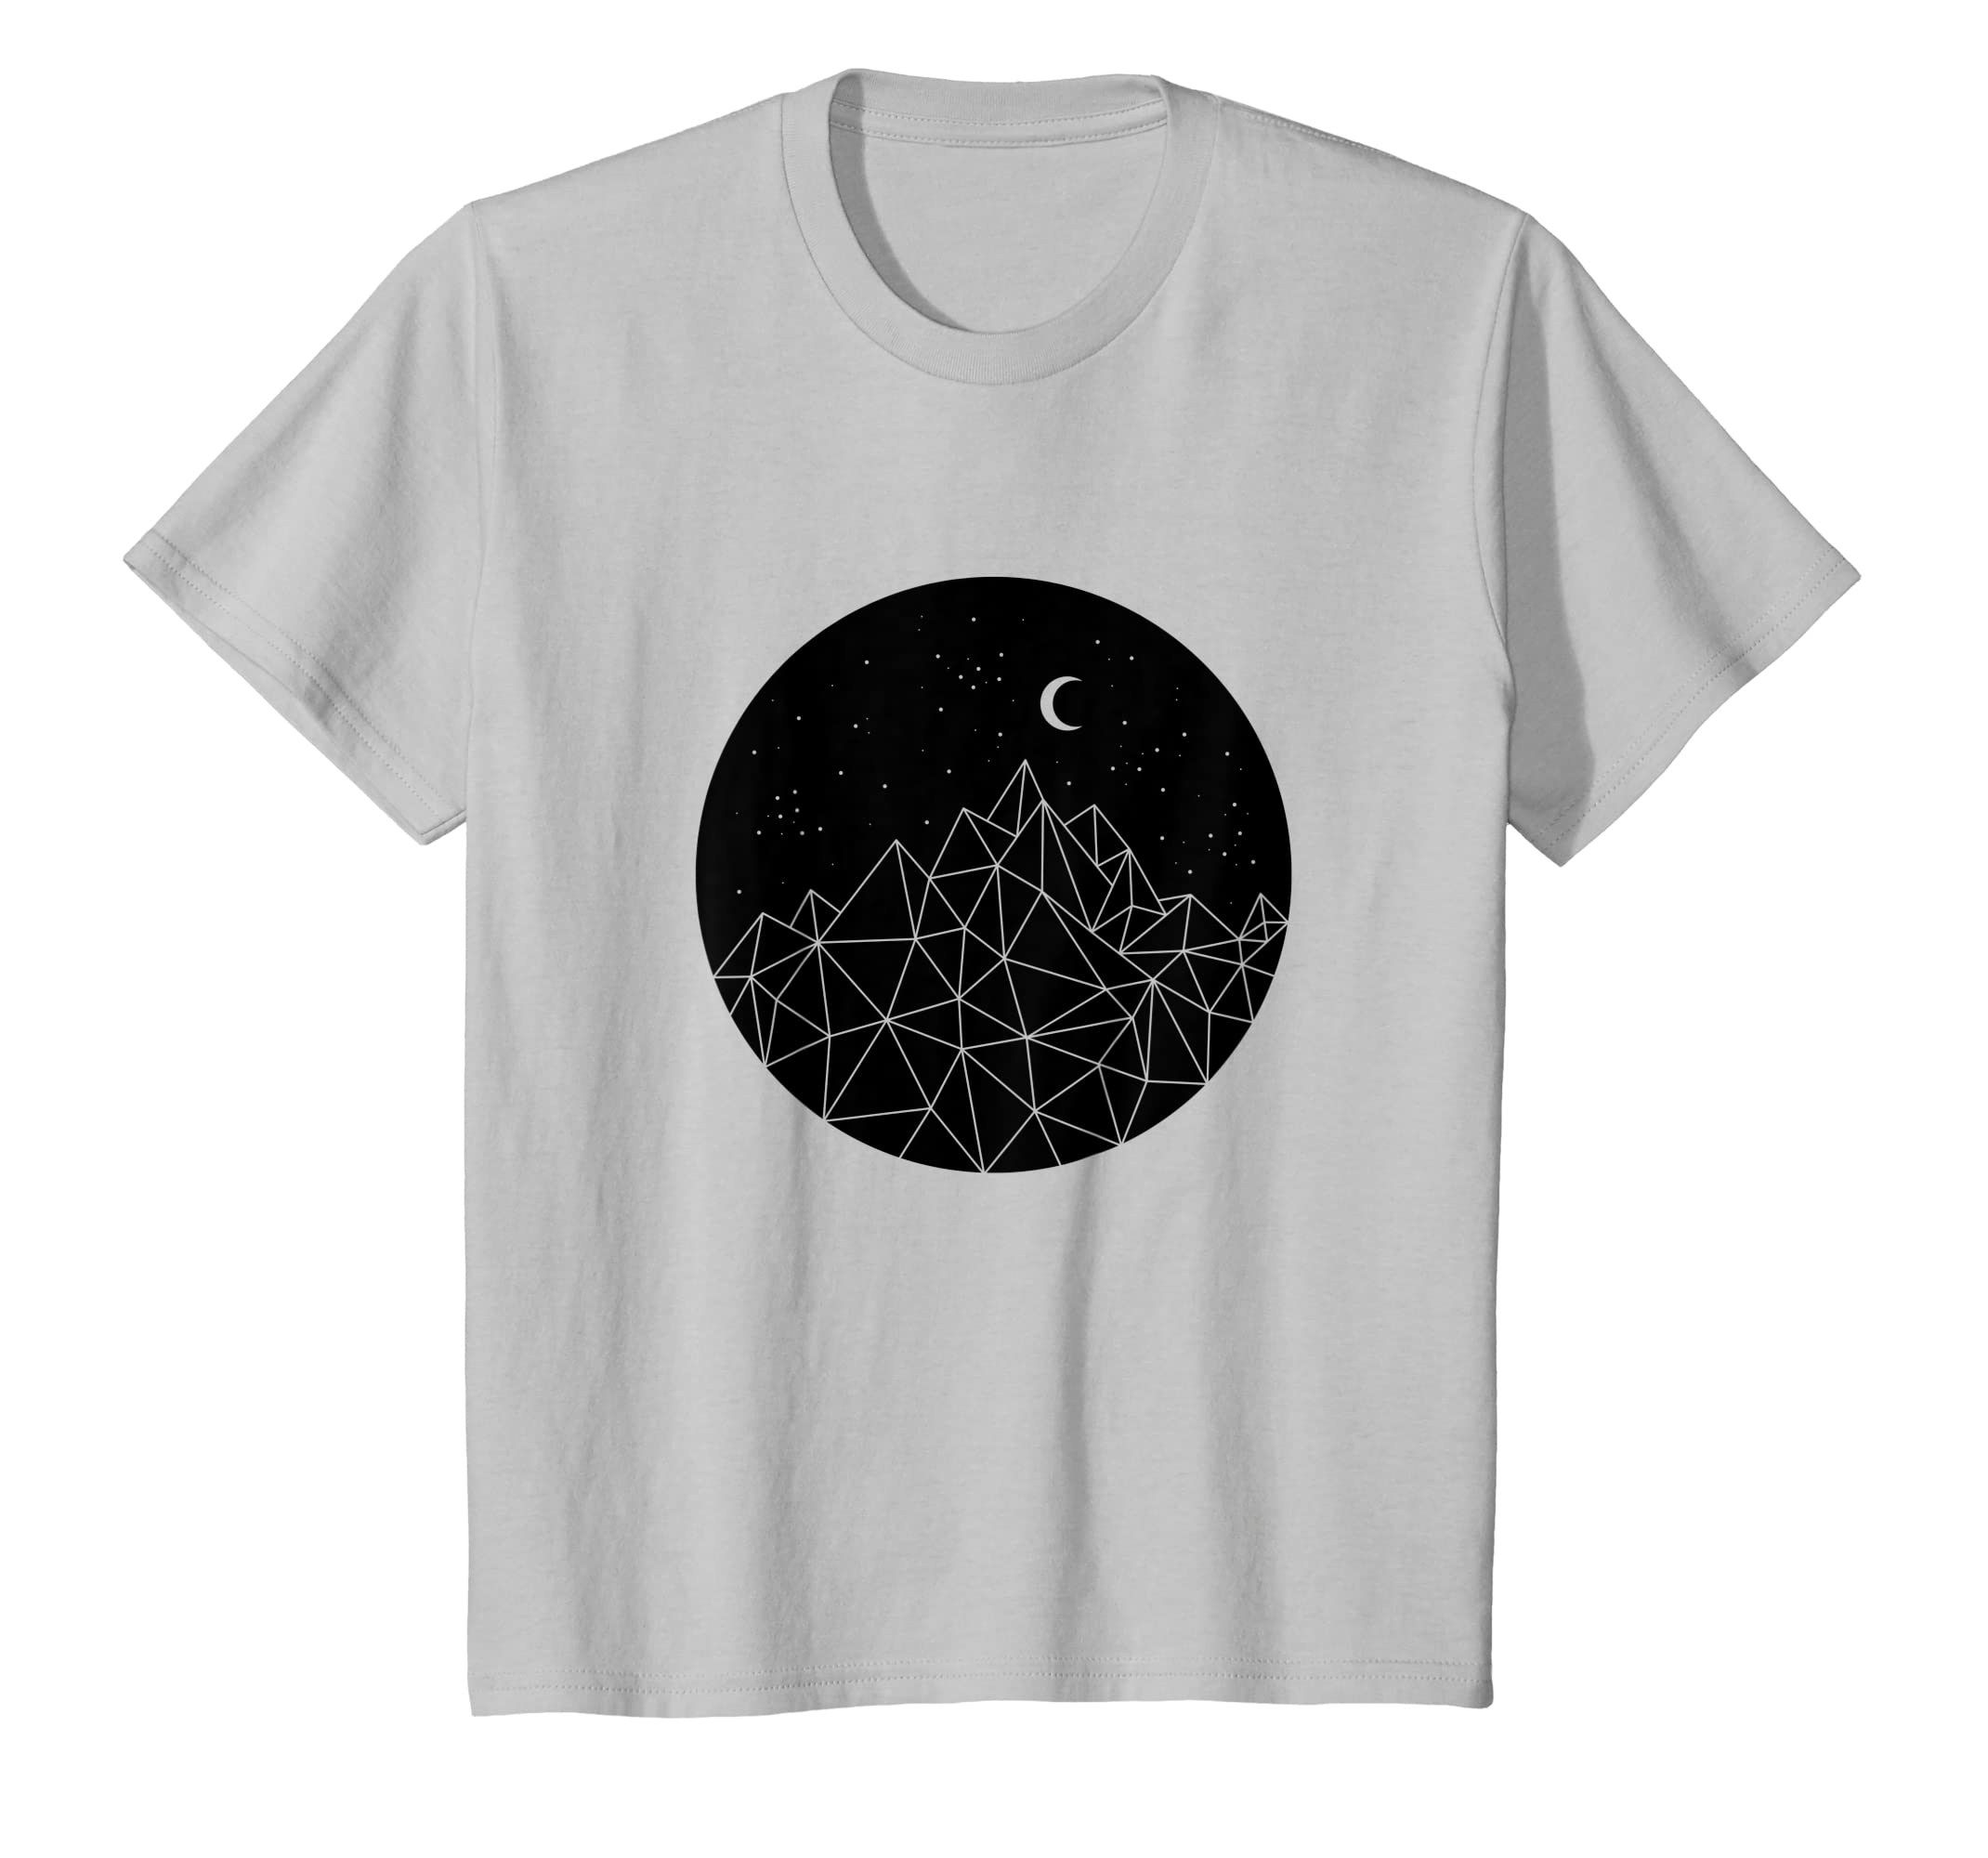 d251643f7145 Amazon.com: Poly Mountain Moon Stars Starry Dark Night Graphic T shirt:  Clothing